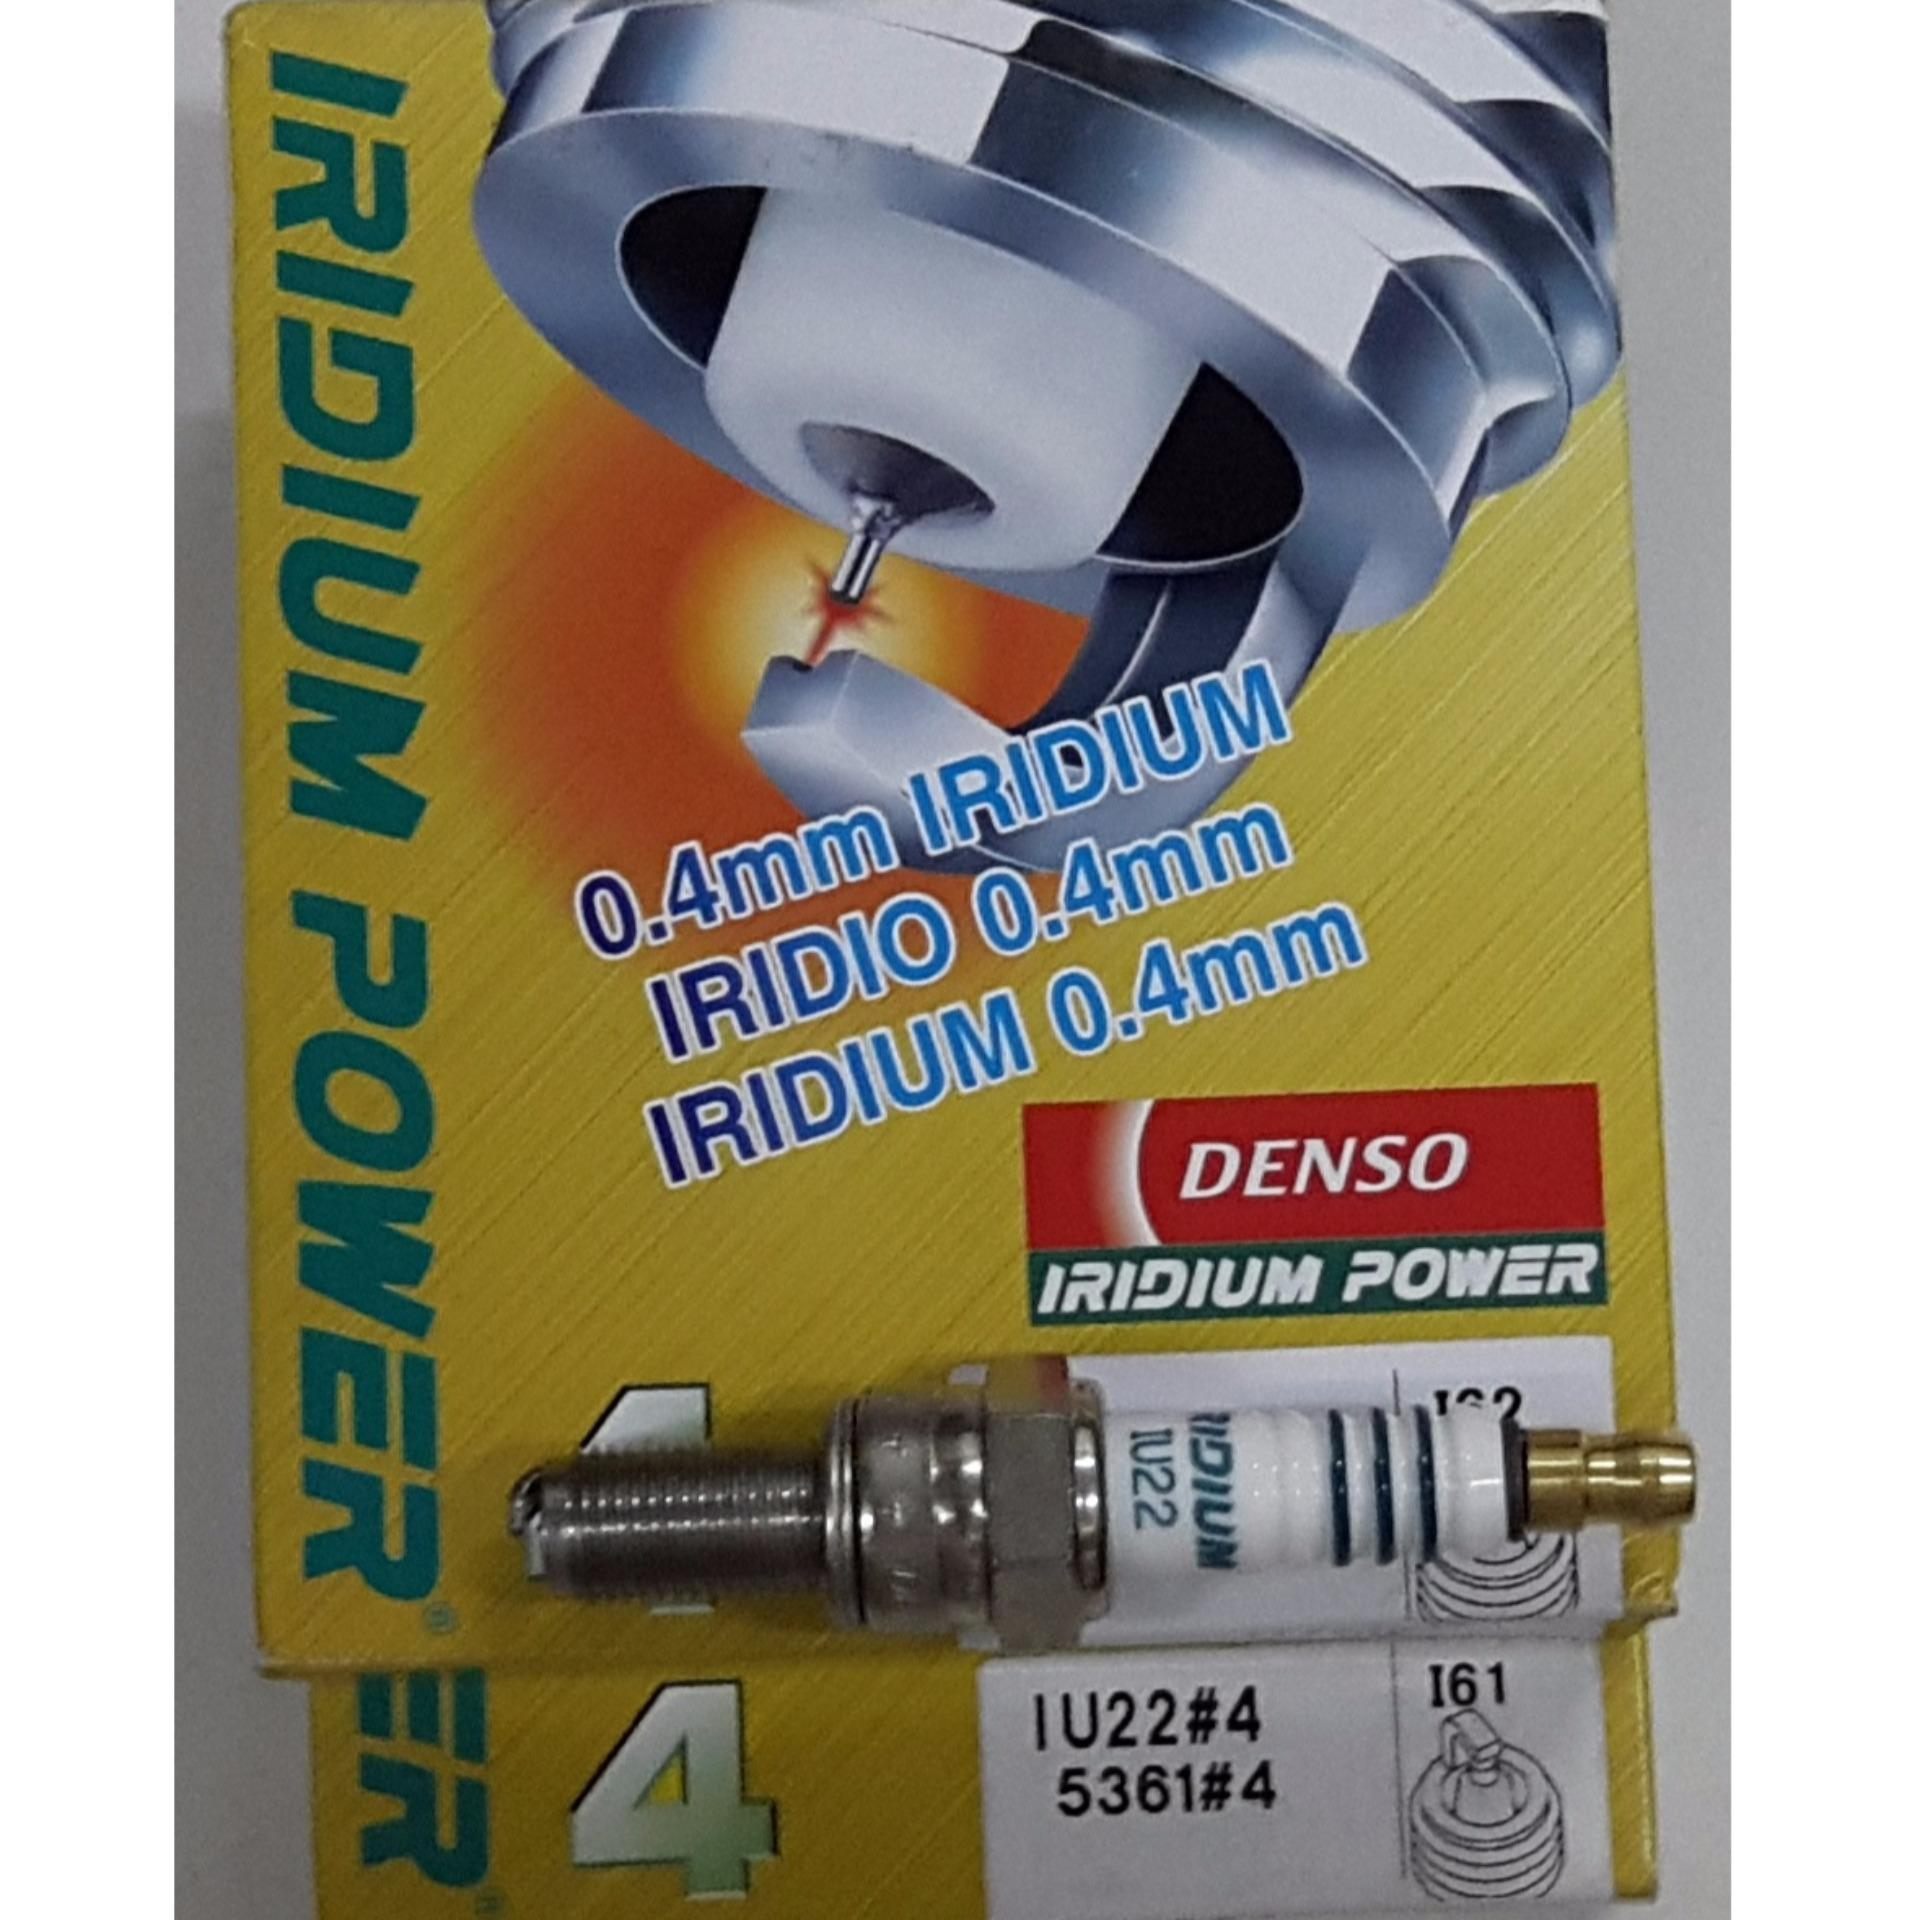 1 Bugi DENSO JAPAN Iridium IU22 (AB110;Lead 110;Vision;Wave RS/RSX/S110;Blade;Fu Neo Fi;Fu II;Excel;Su EN150;Impulse) - Made in Japan.